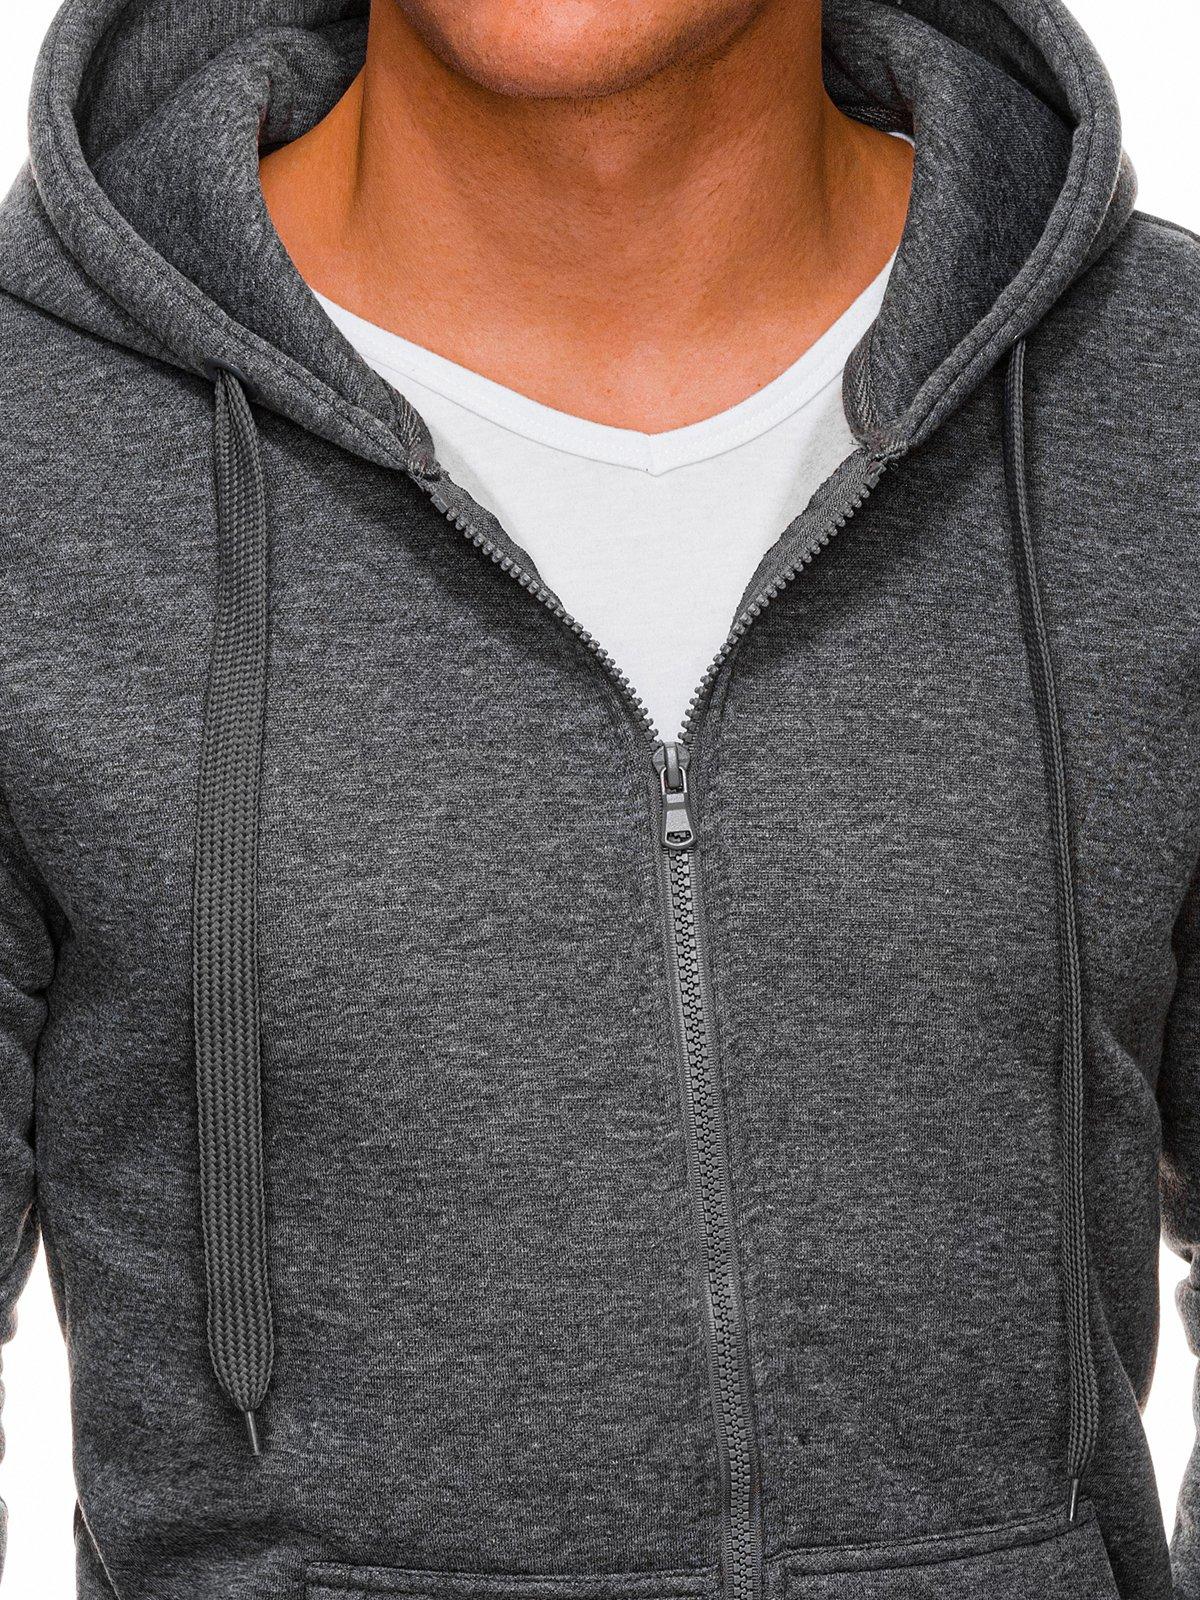 Bluza męska rozpinana z kapturem 895B szara